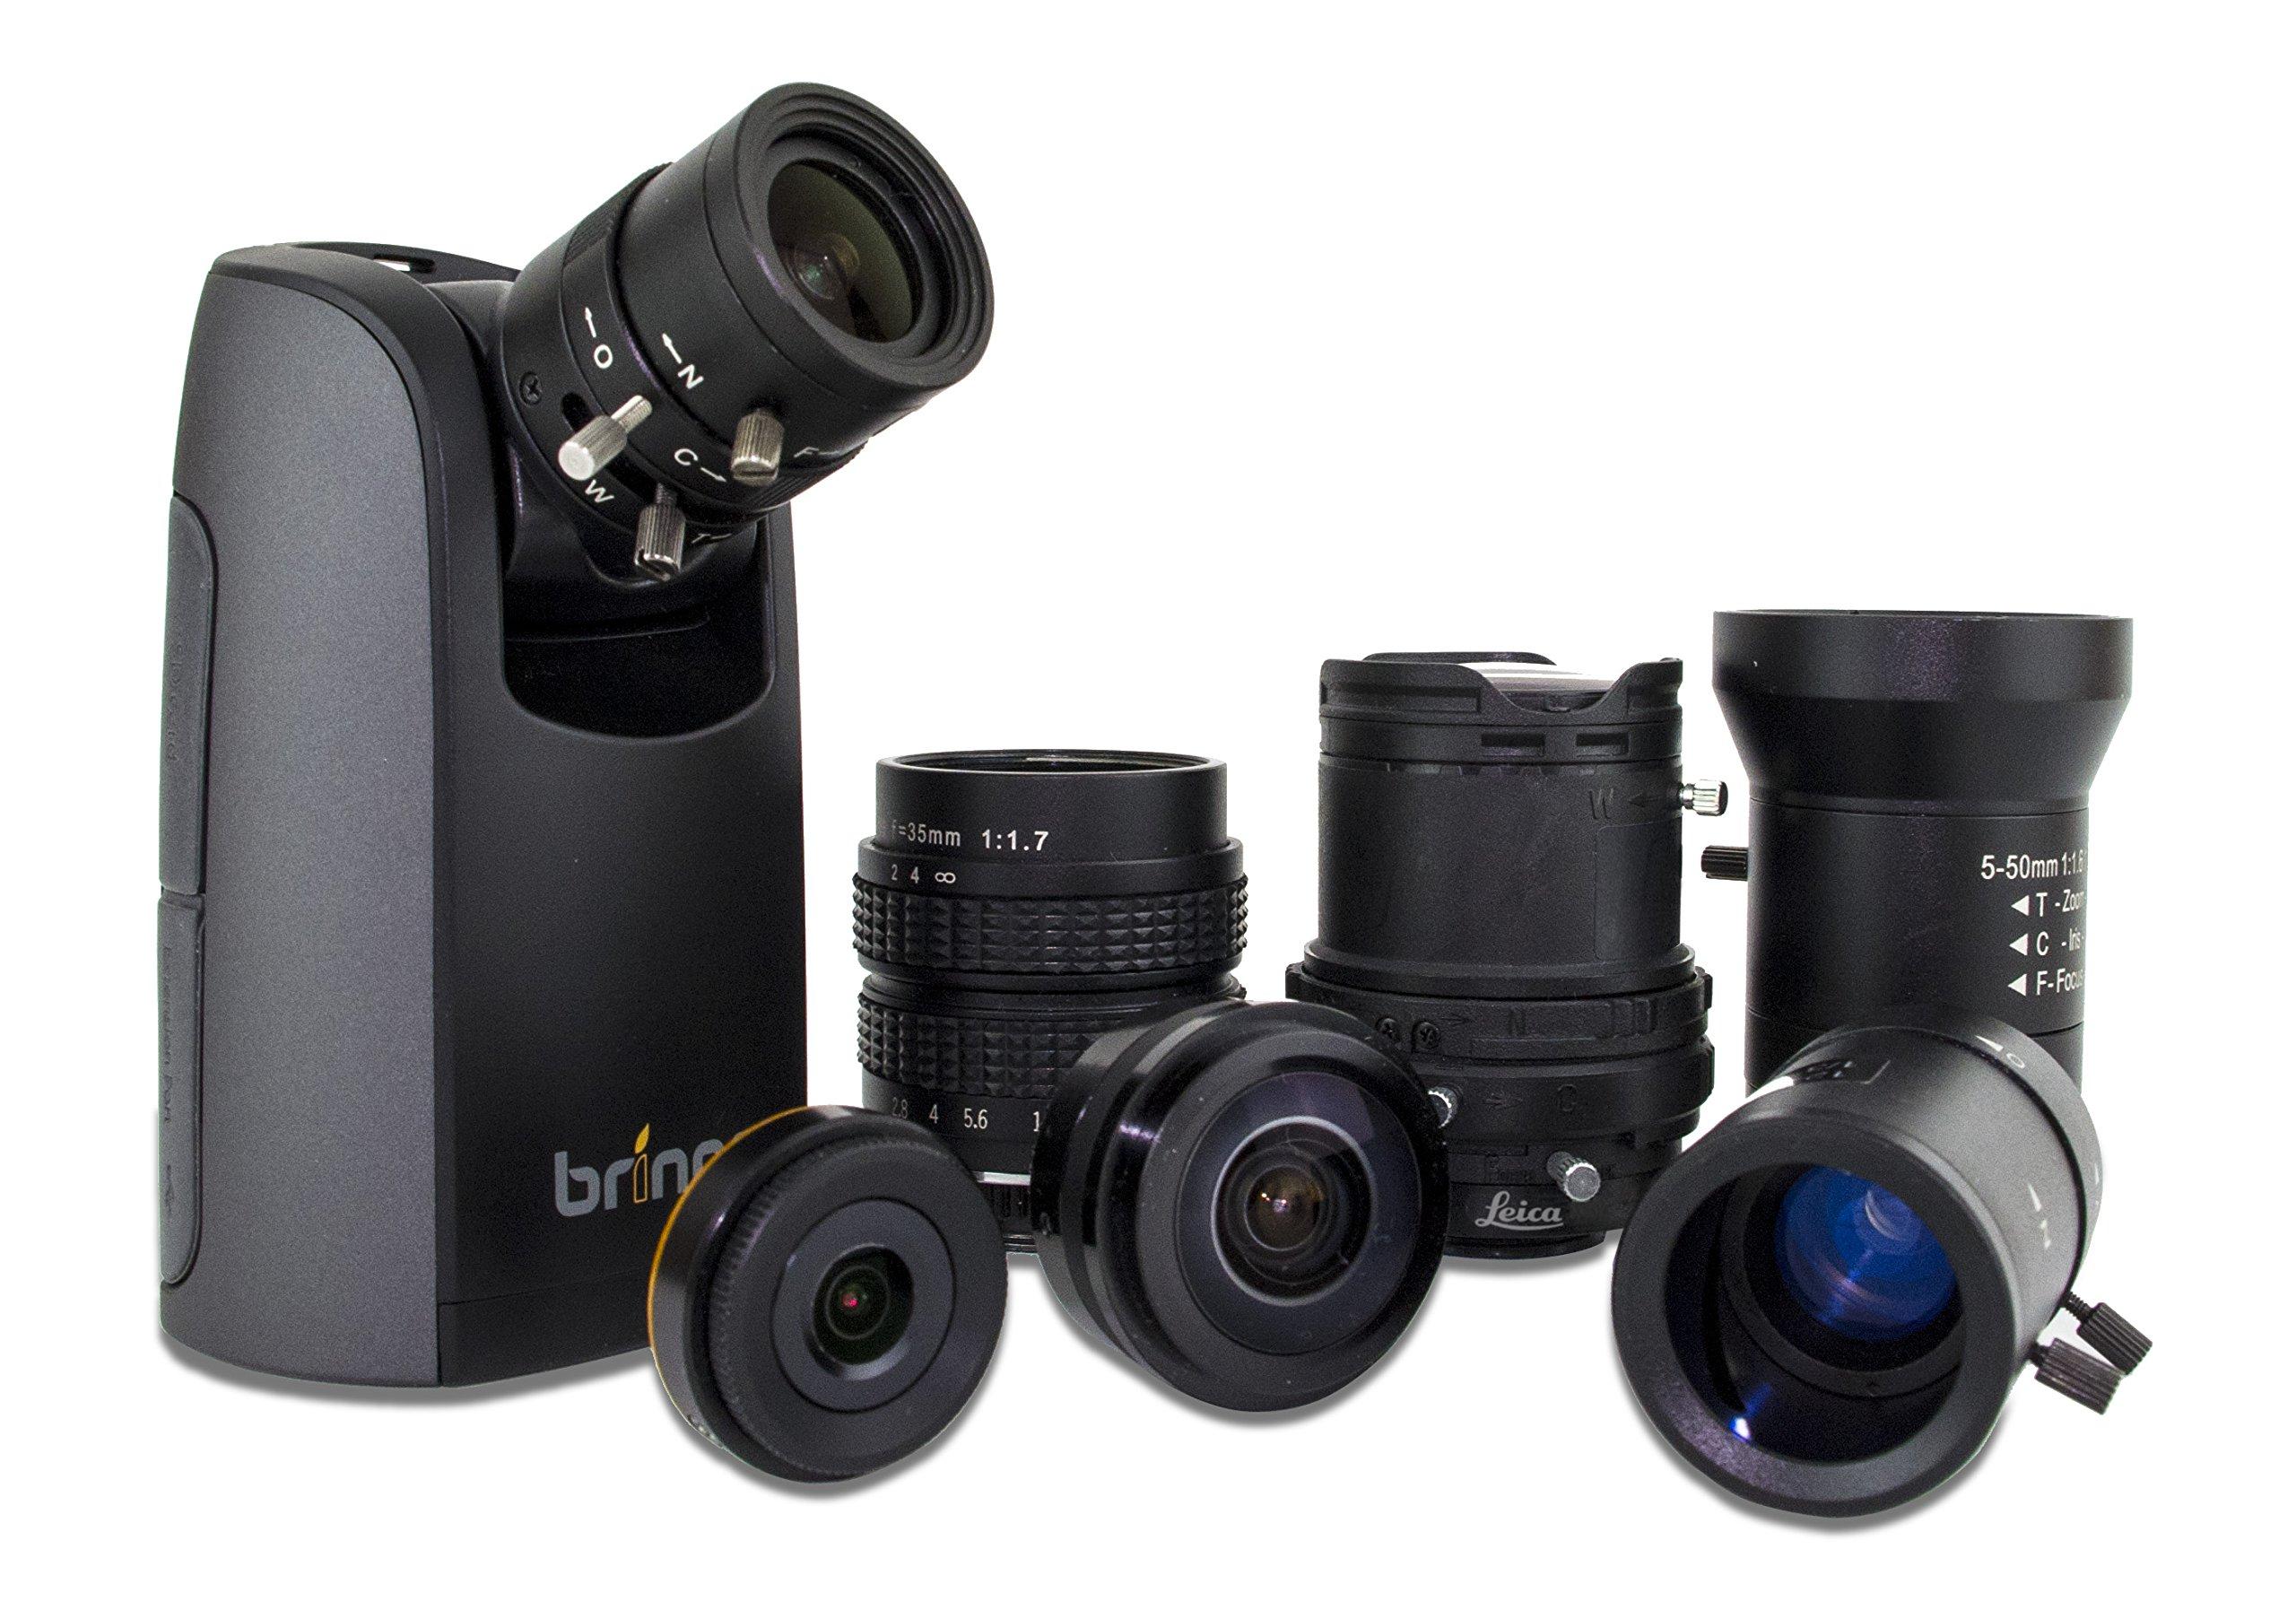 Brinno BCS 24-70 24-70mm f/1.4 Lens for Brinno TLC200 PRO HDR Time Lapse Video Camera by Brinno